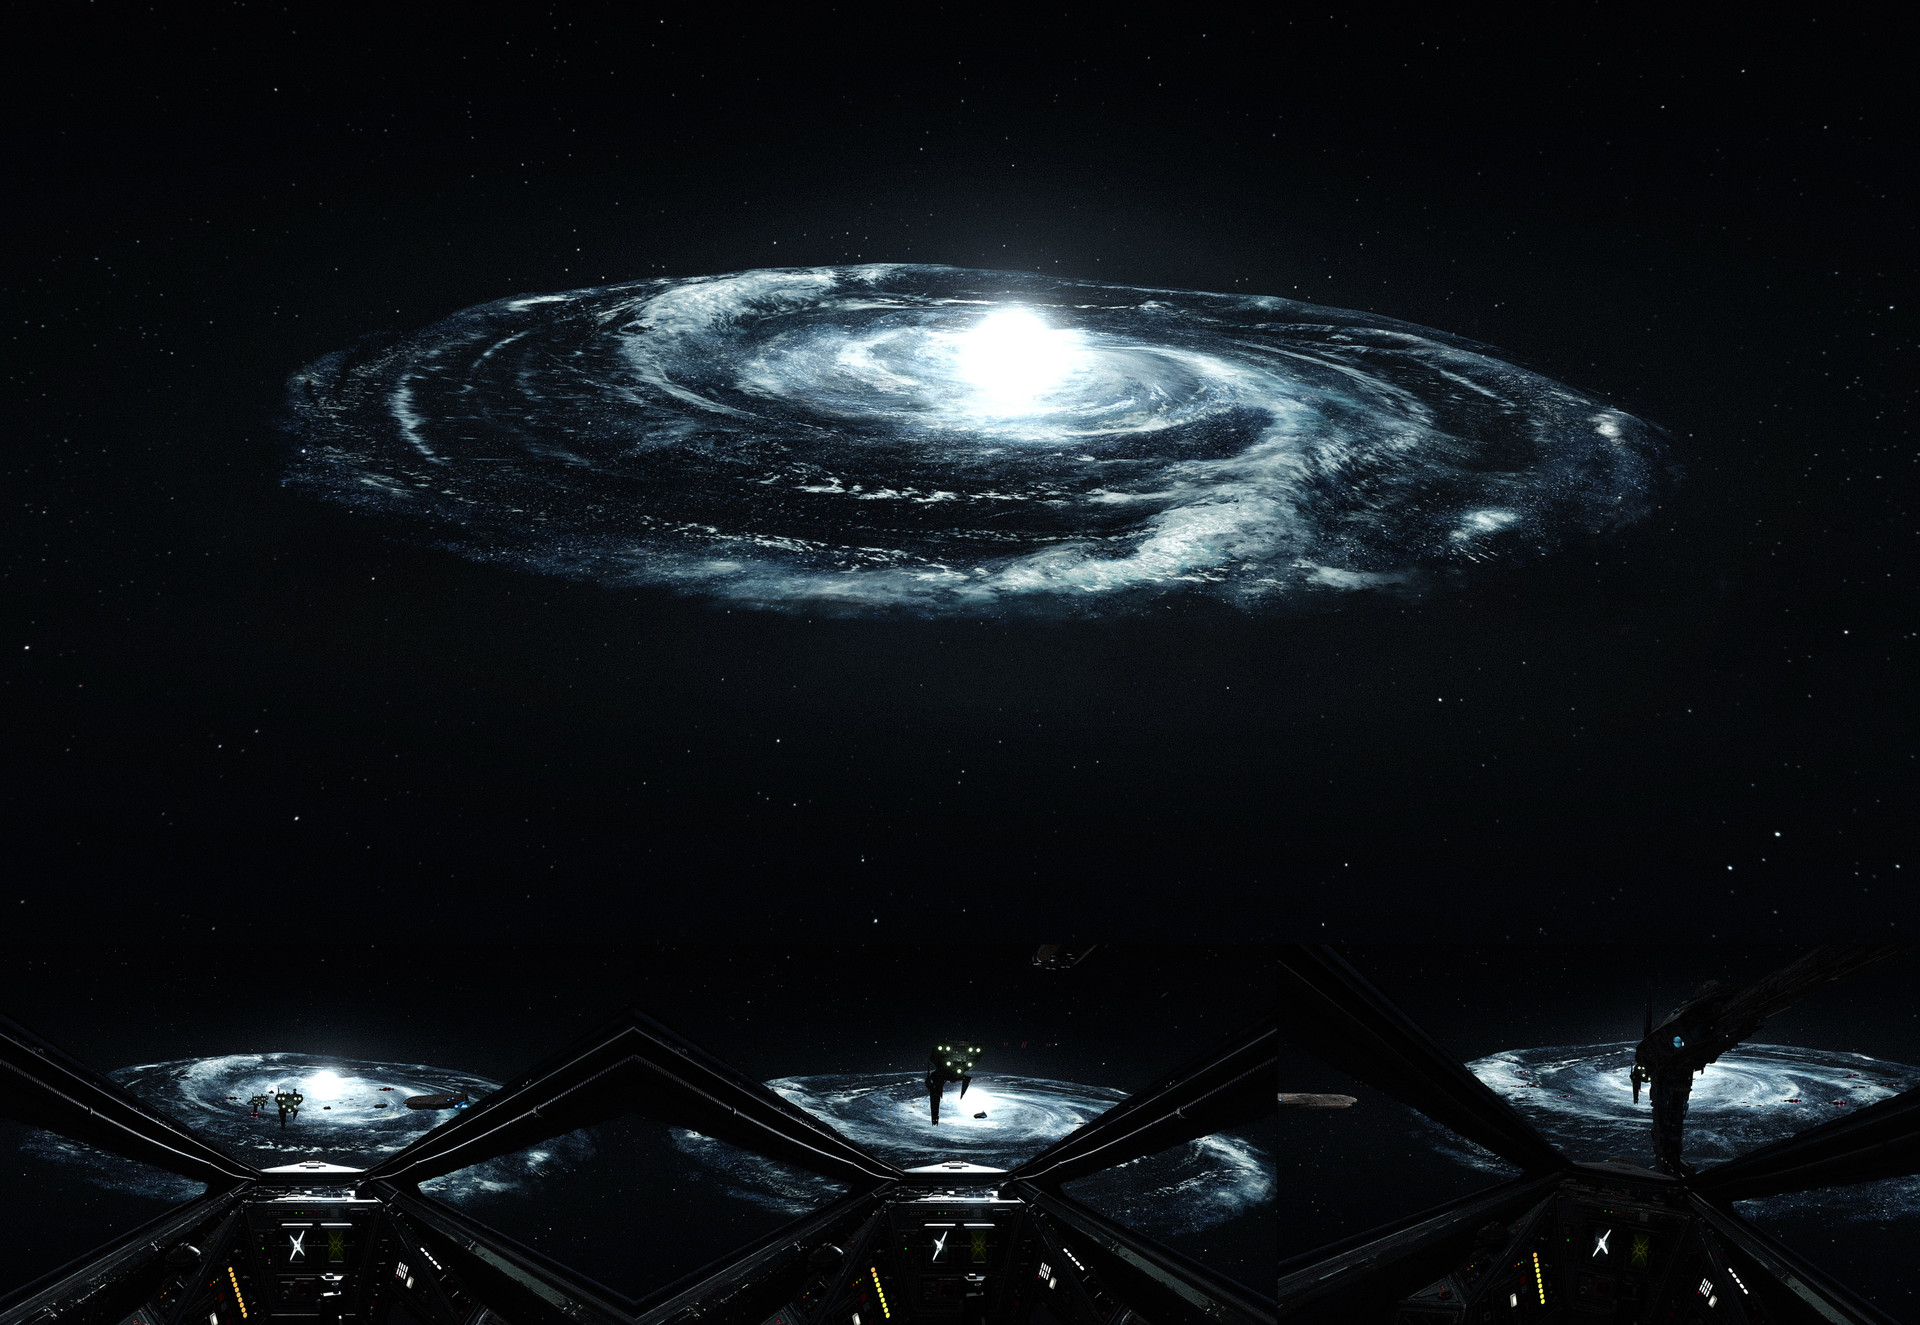 Darius kalinauskas starwars galaxy background dice